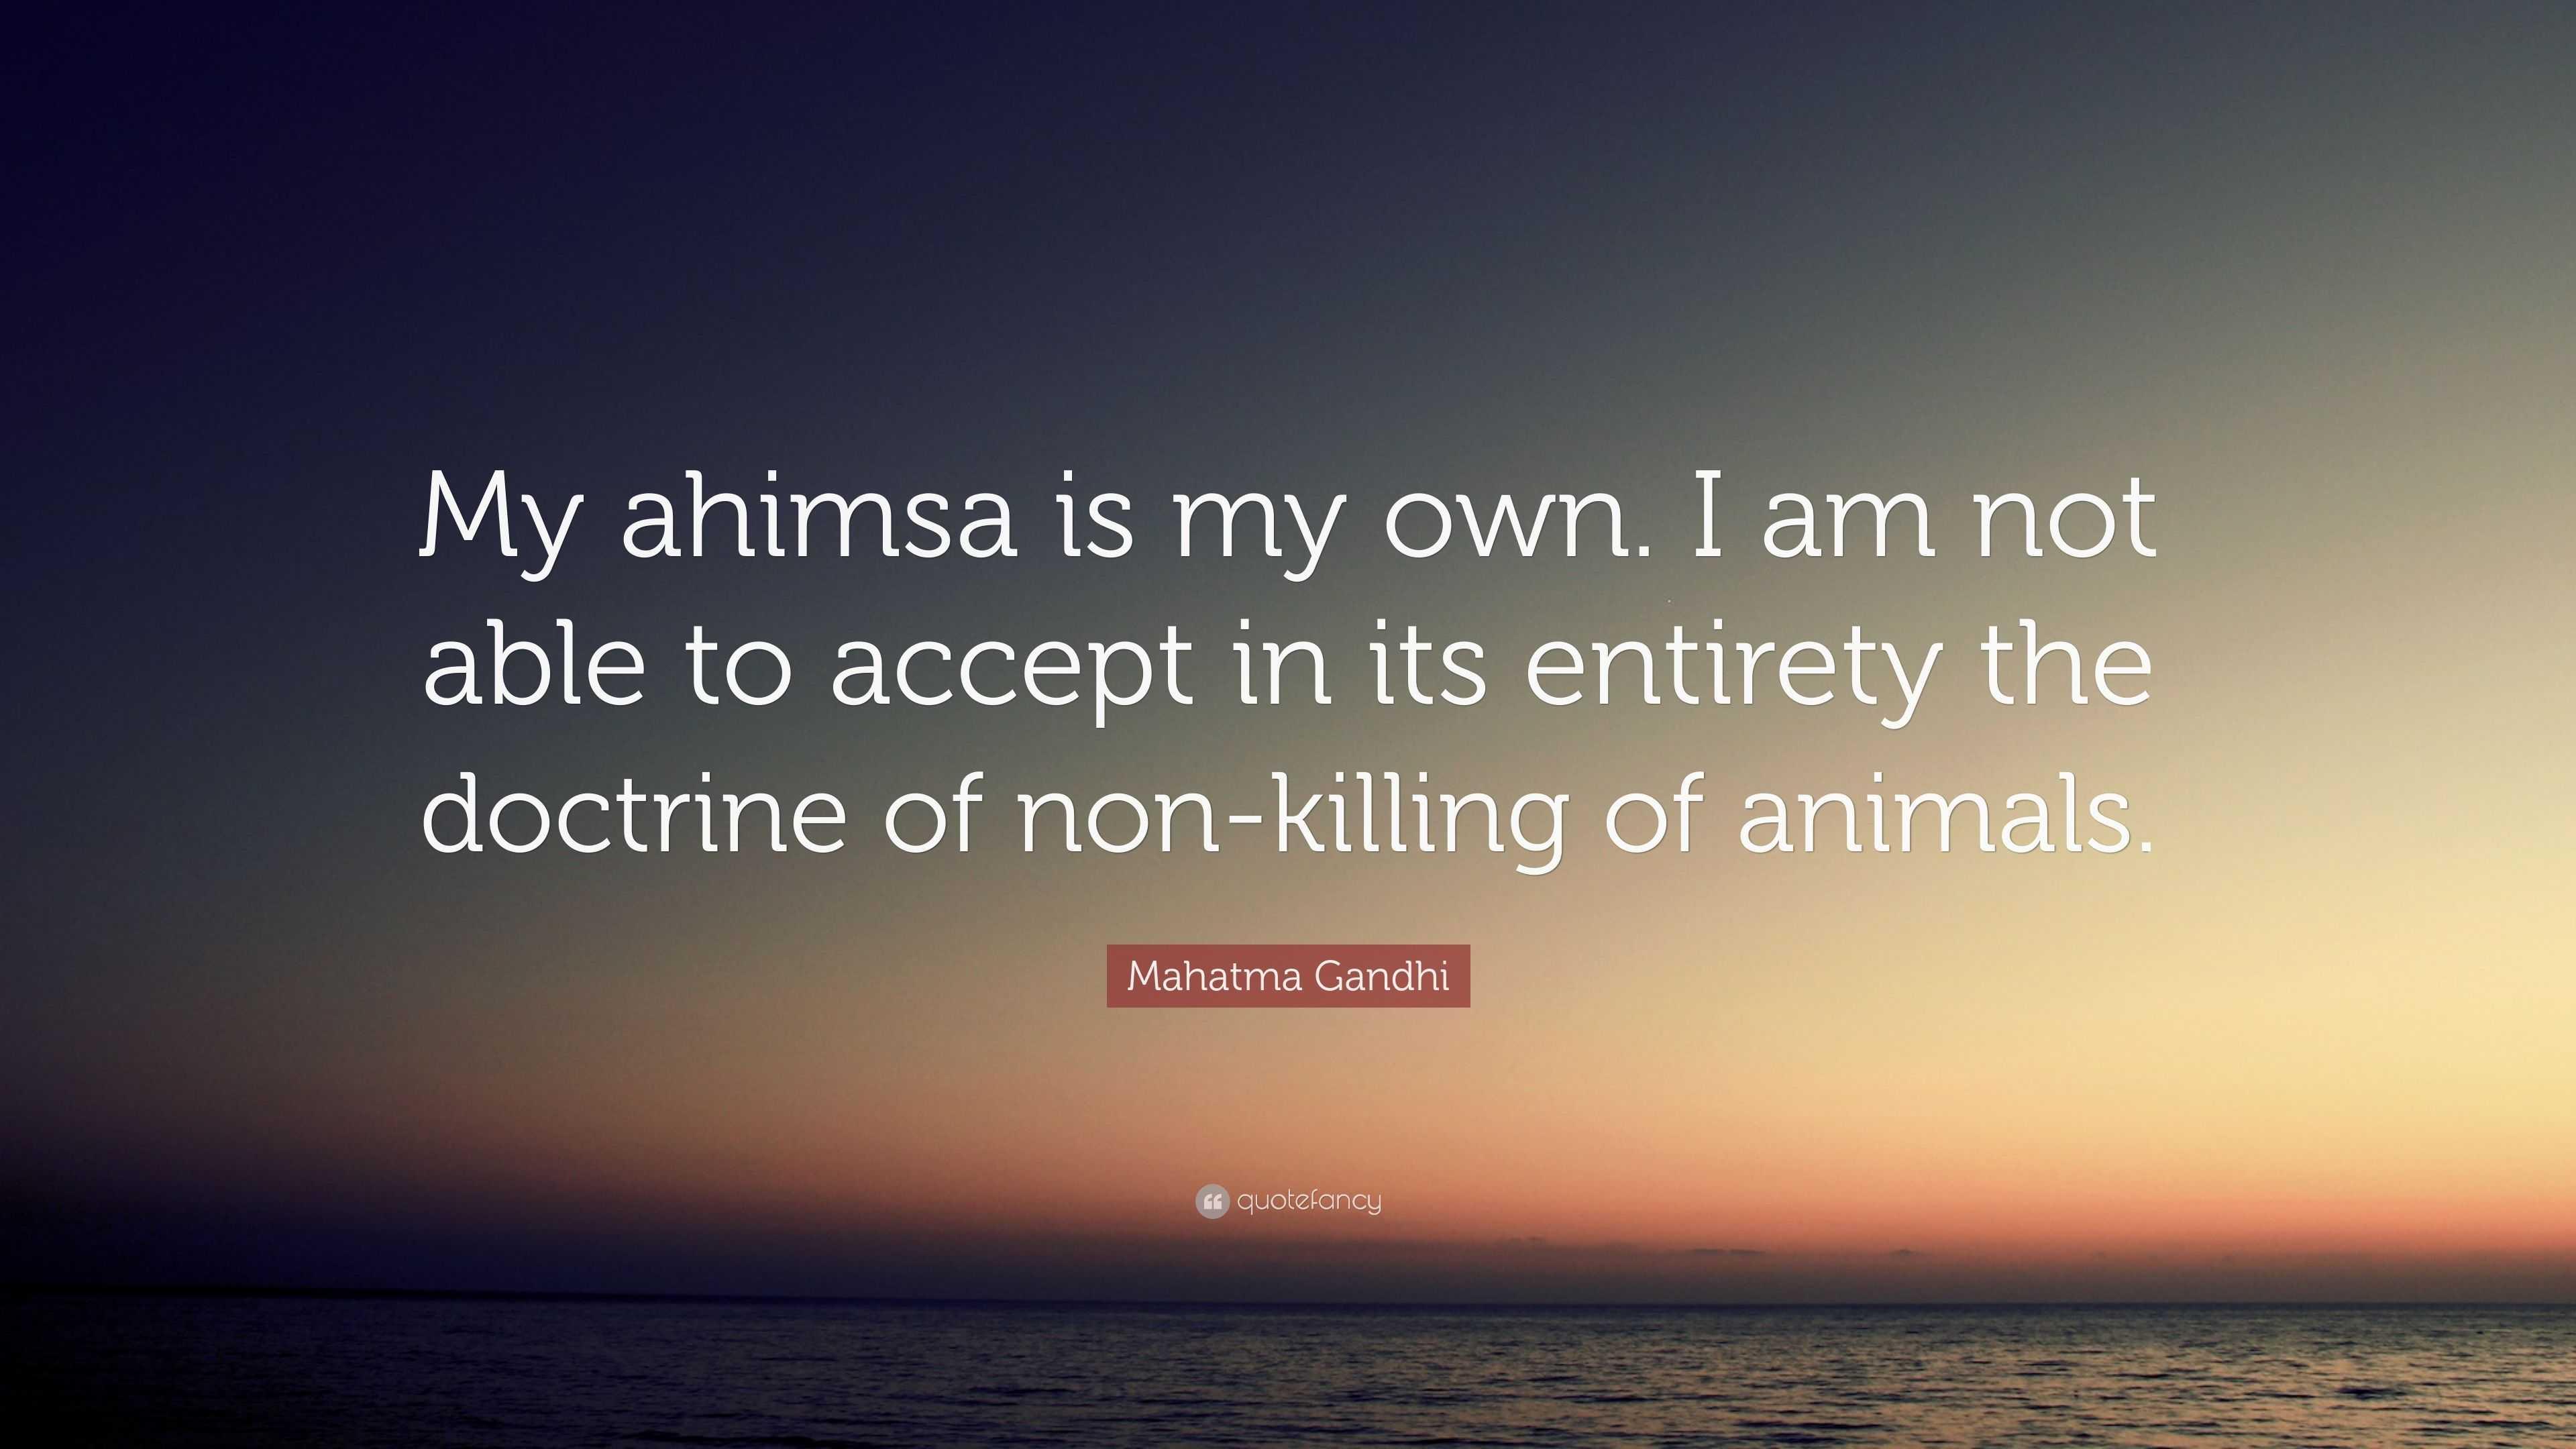 gandhi and ahimsa